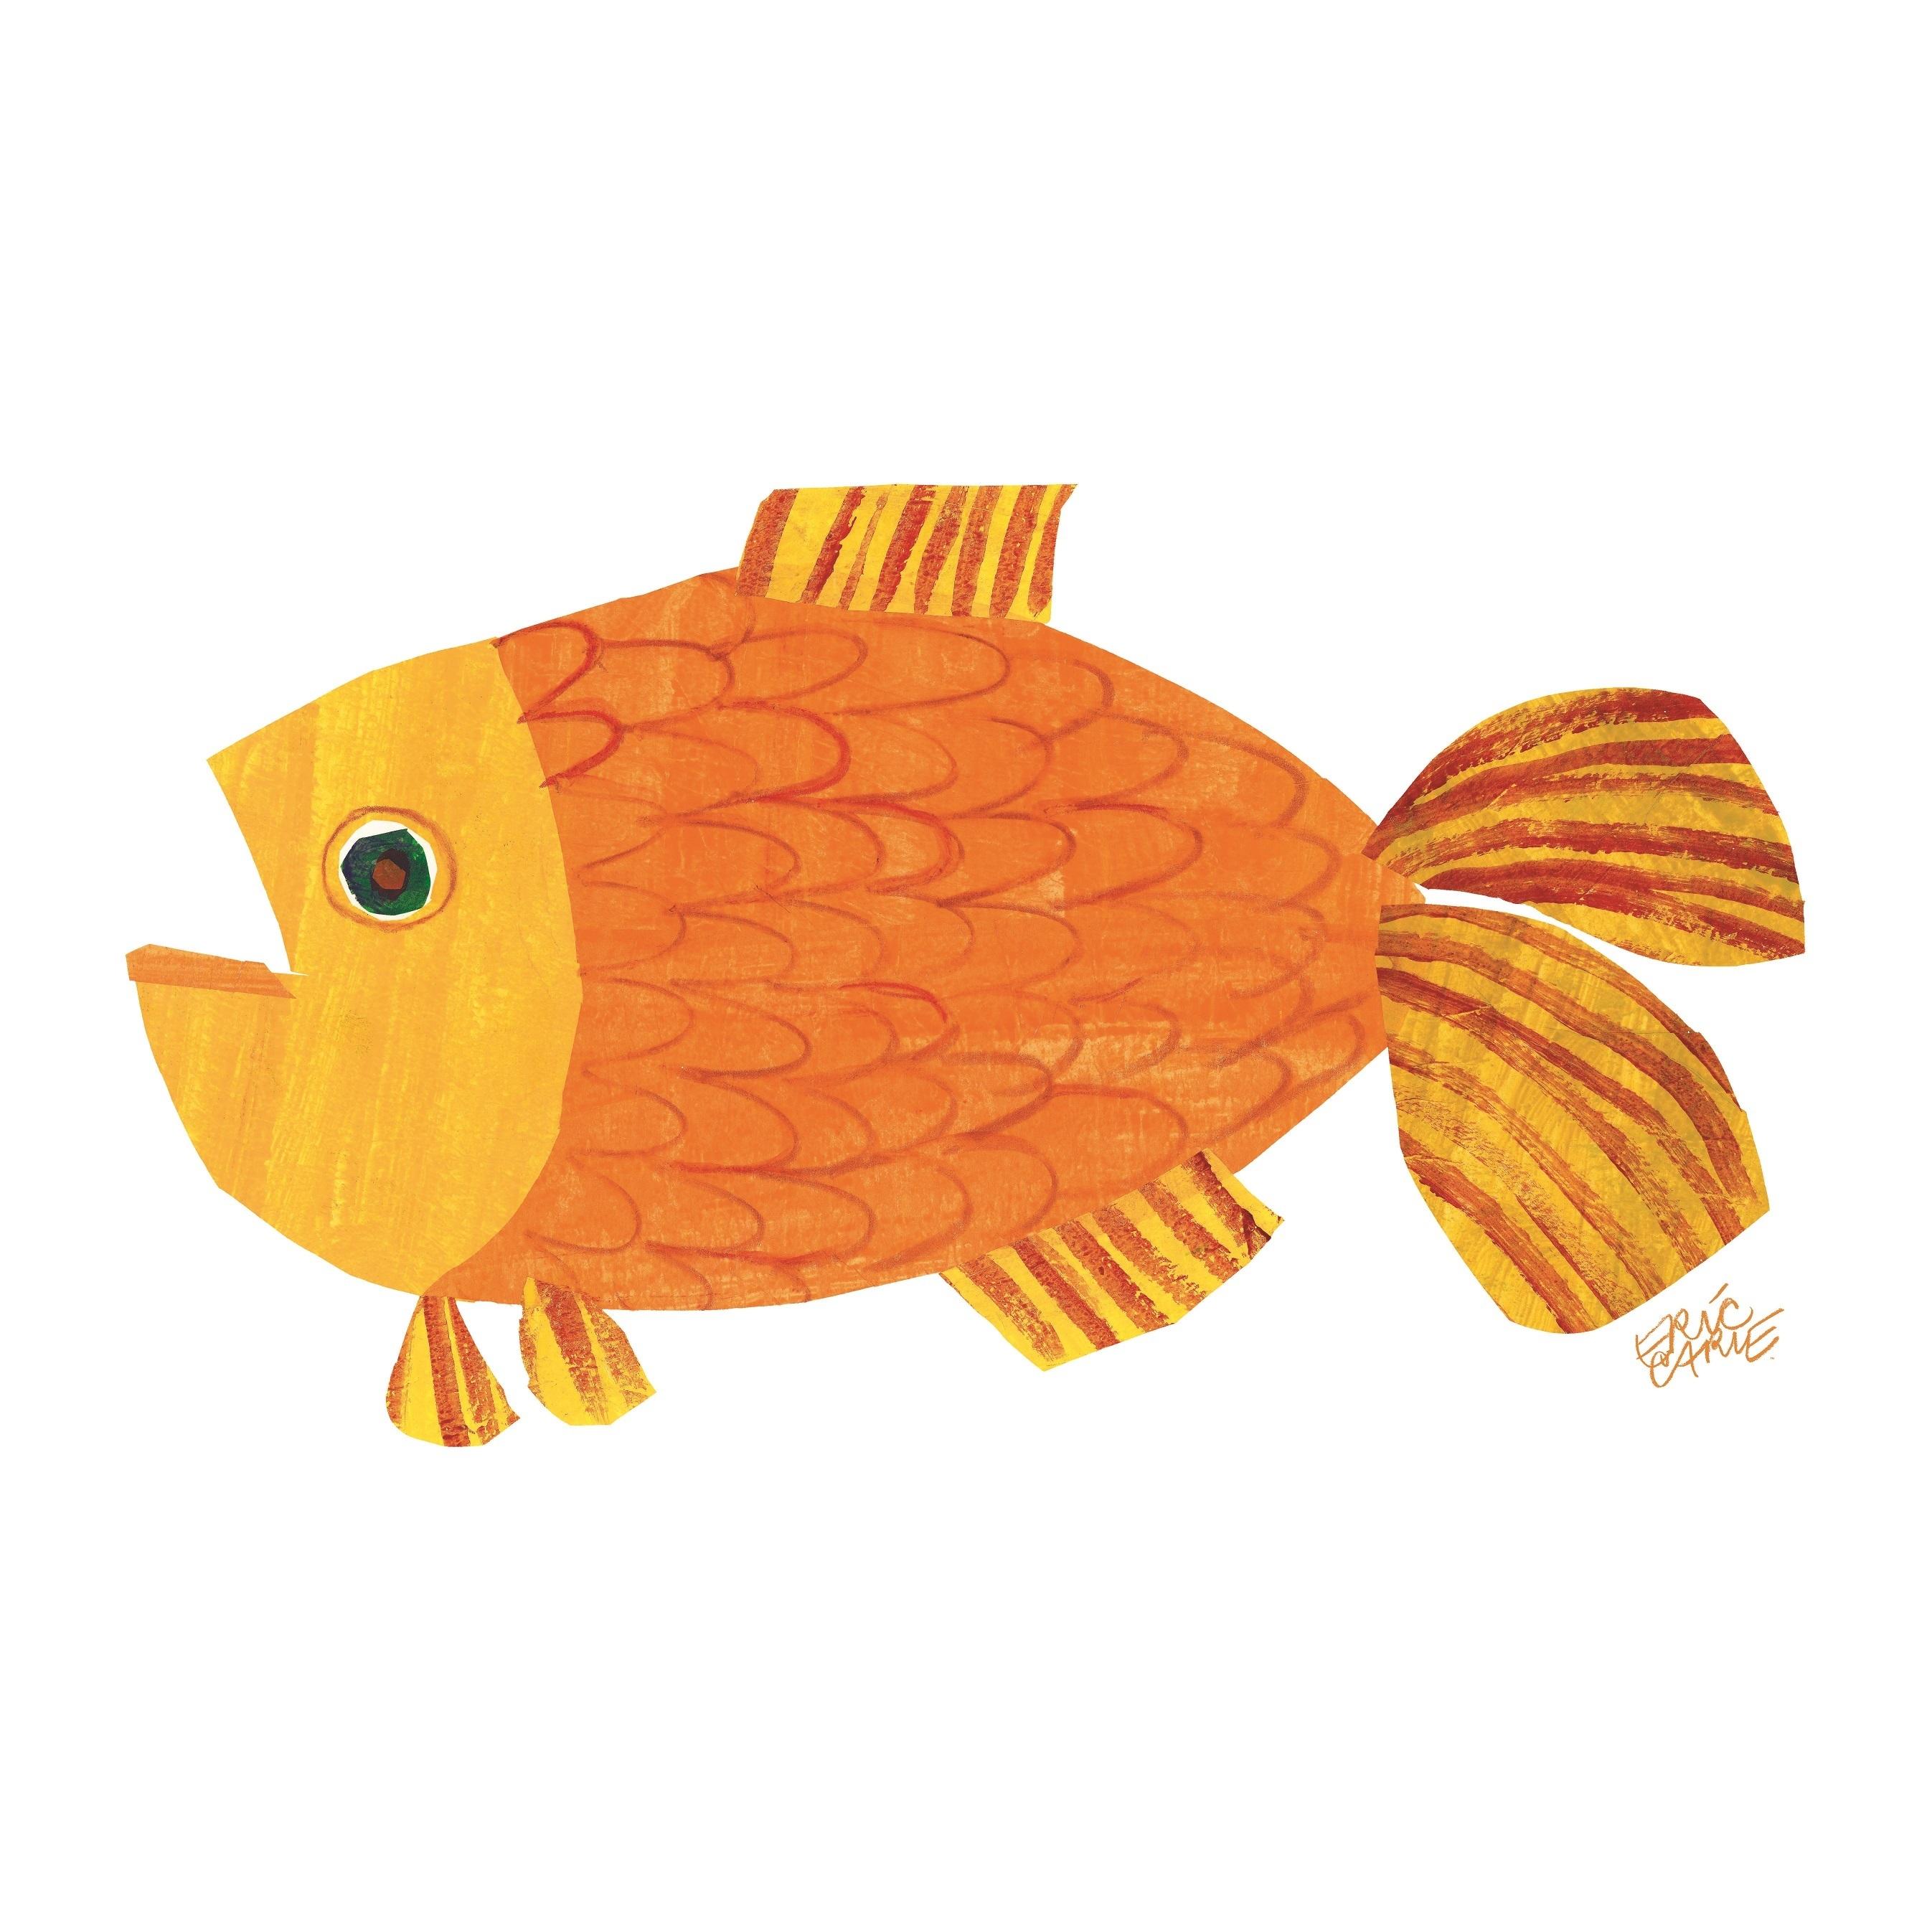 brown bear eric carle goldfish clipart - Eric Carle Brown Bear PNG